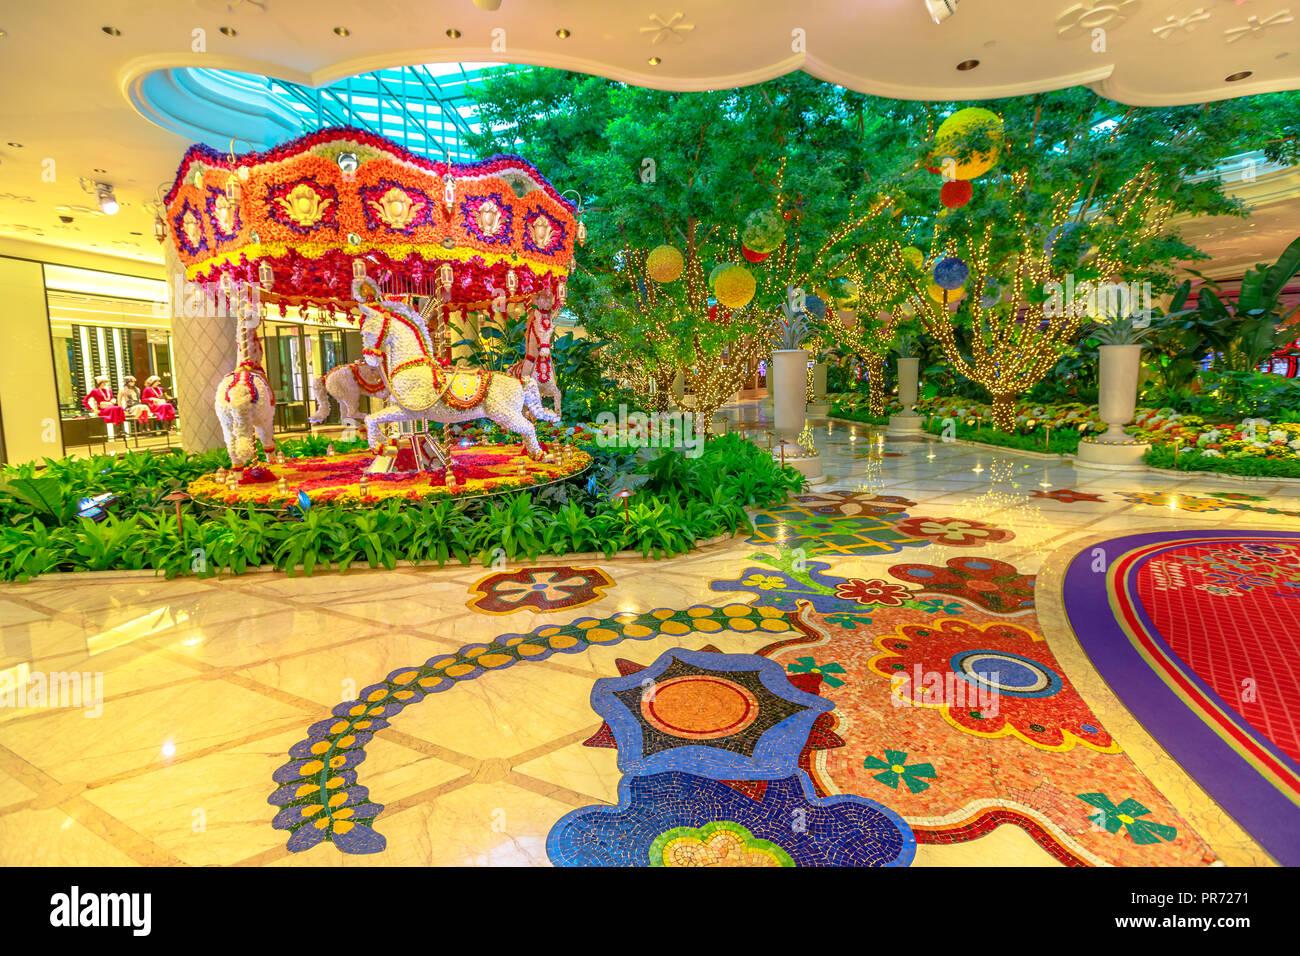 Las Vegas Nevada Usa August 18 2018 Animated Flowers Carousel In The Lobby At Wynn Hotel